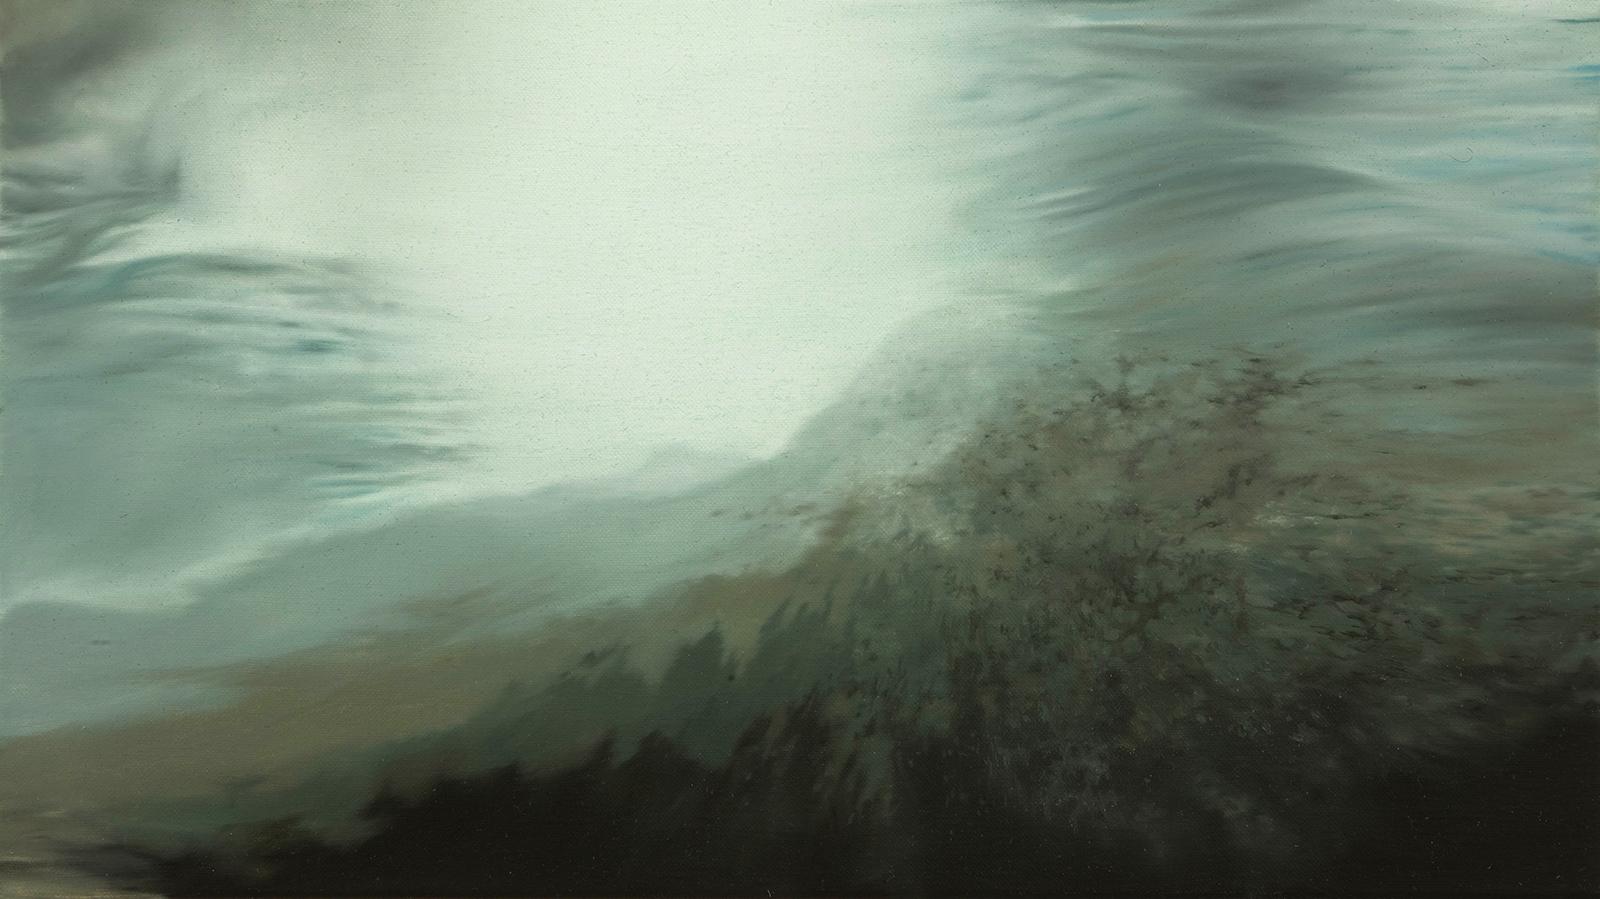 Nordmeer (Brandung) 2007, 30 x 52 cm, Öl auf Leinwand  North Atlantic Ocean (Breakwater) 2007, 30 x 52 cm, oil on canvas